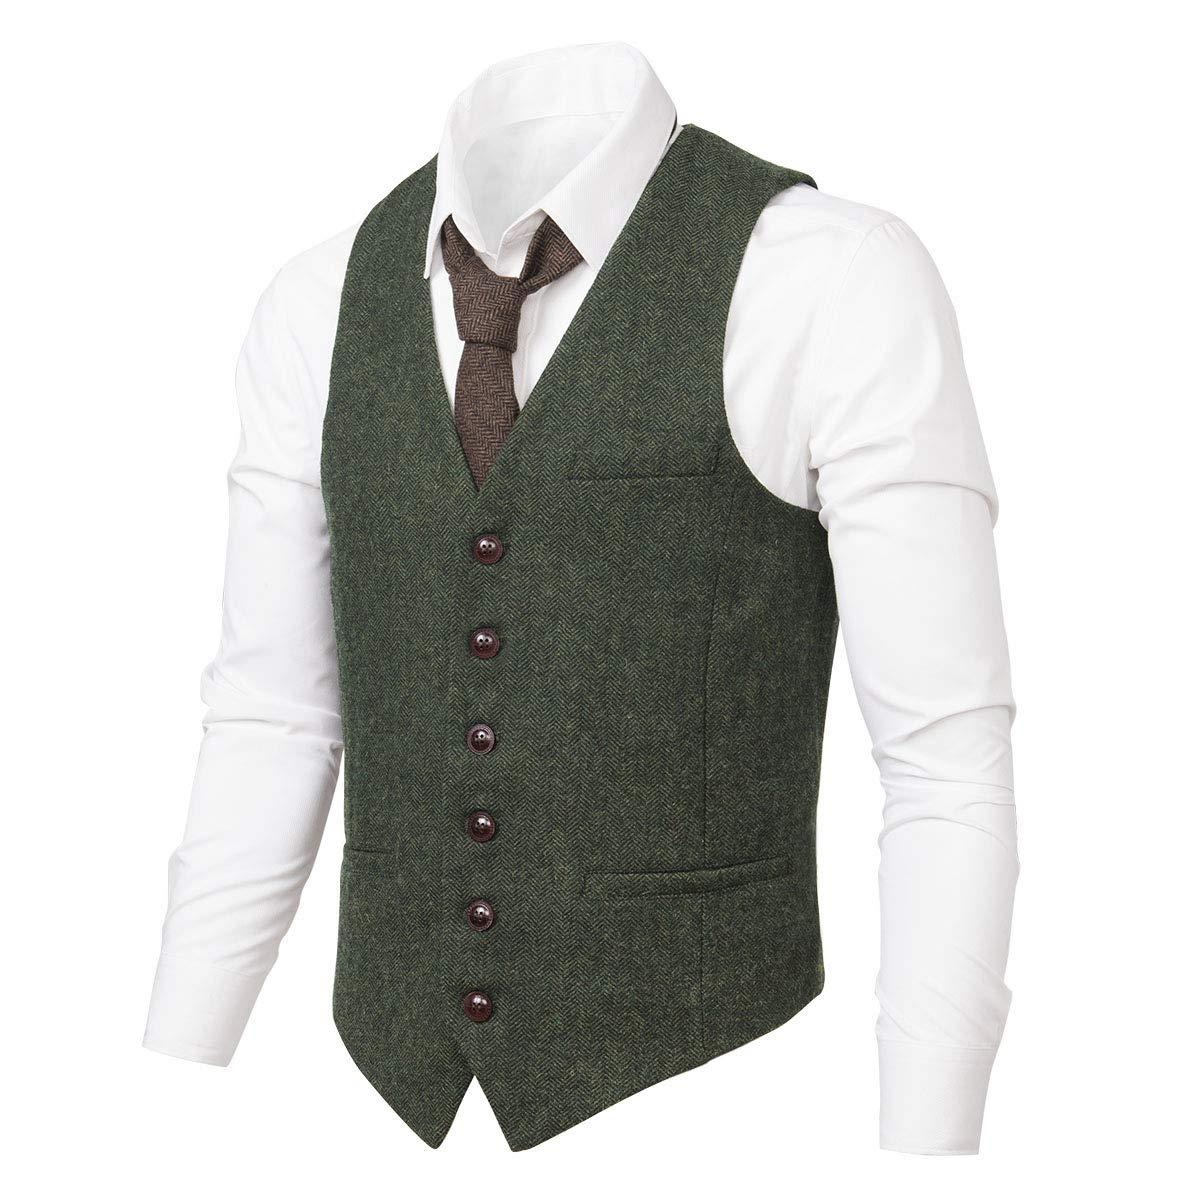 Suits & Blazers Vests Fashion Single Breasted Woolen Suit Vest Men 2018 Autumn New Sleeveless Wool Vest Waistcoat Men Business Wedding Vests For Men